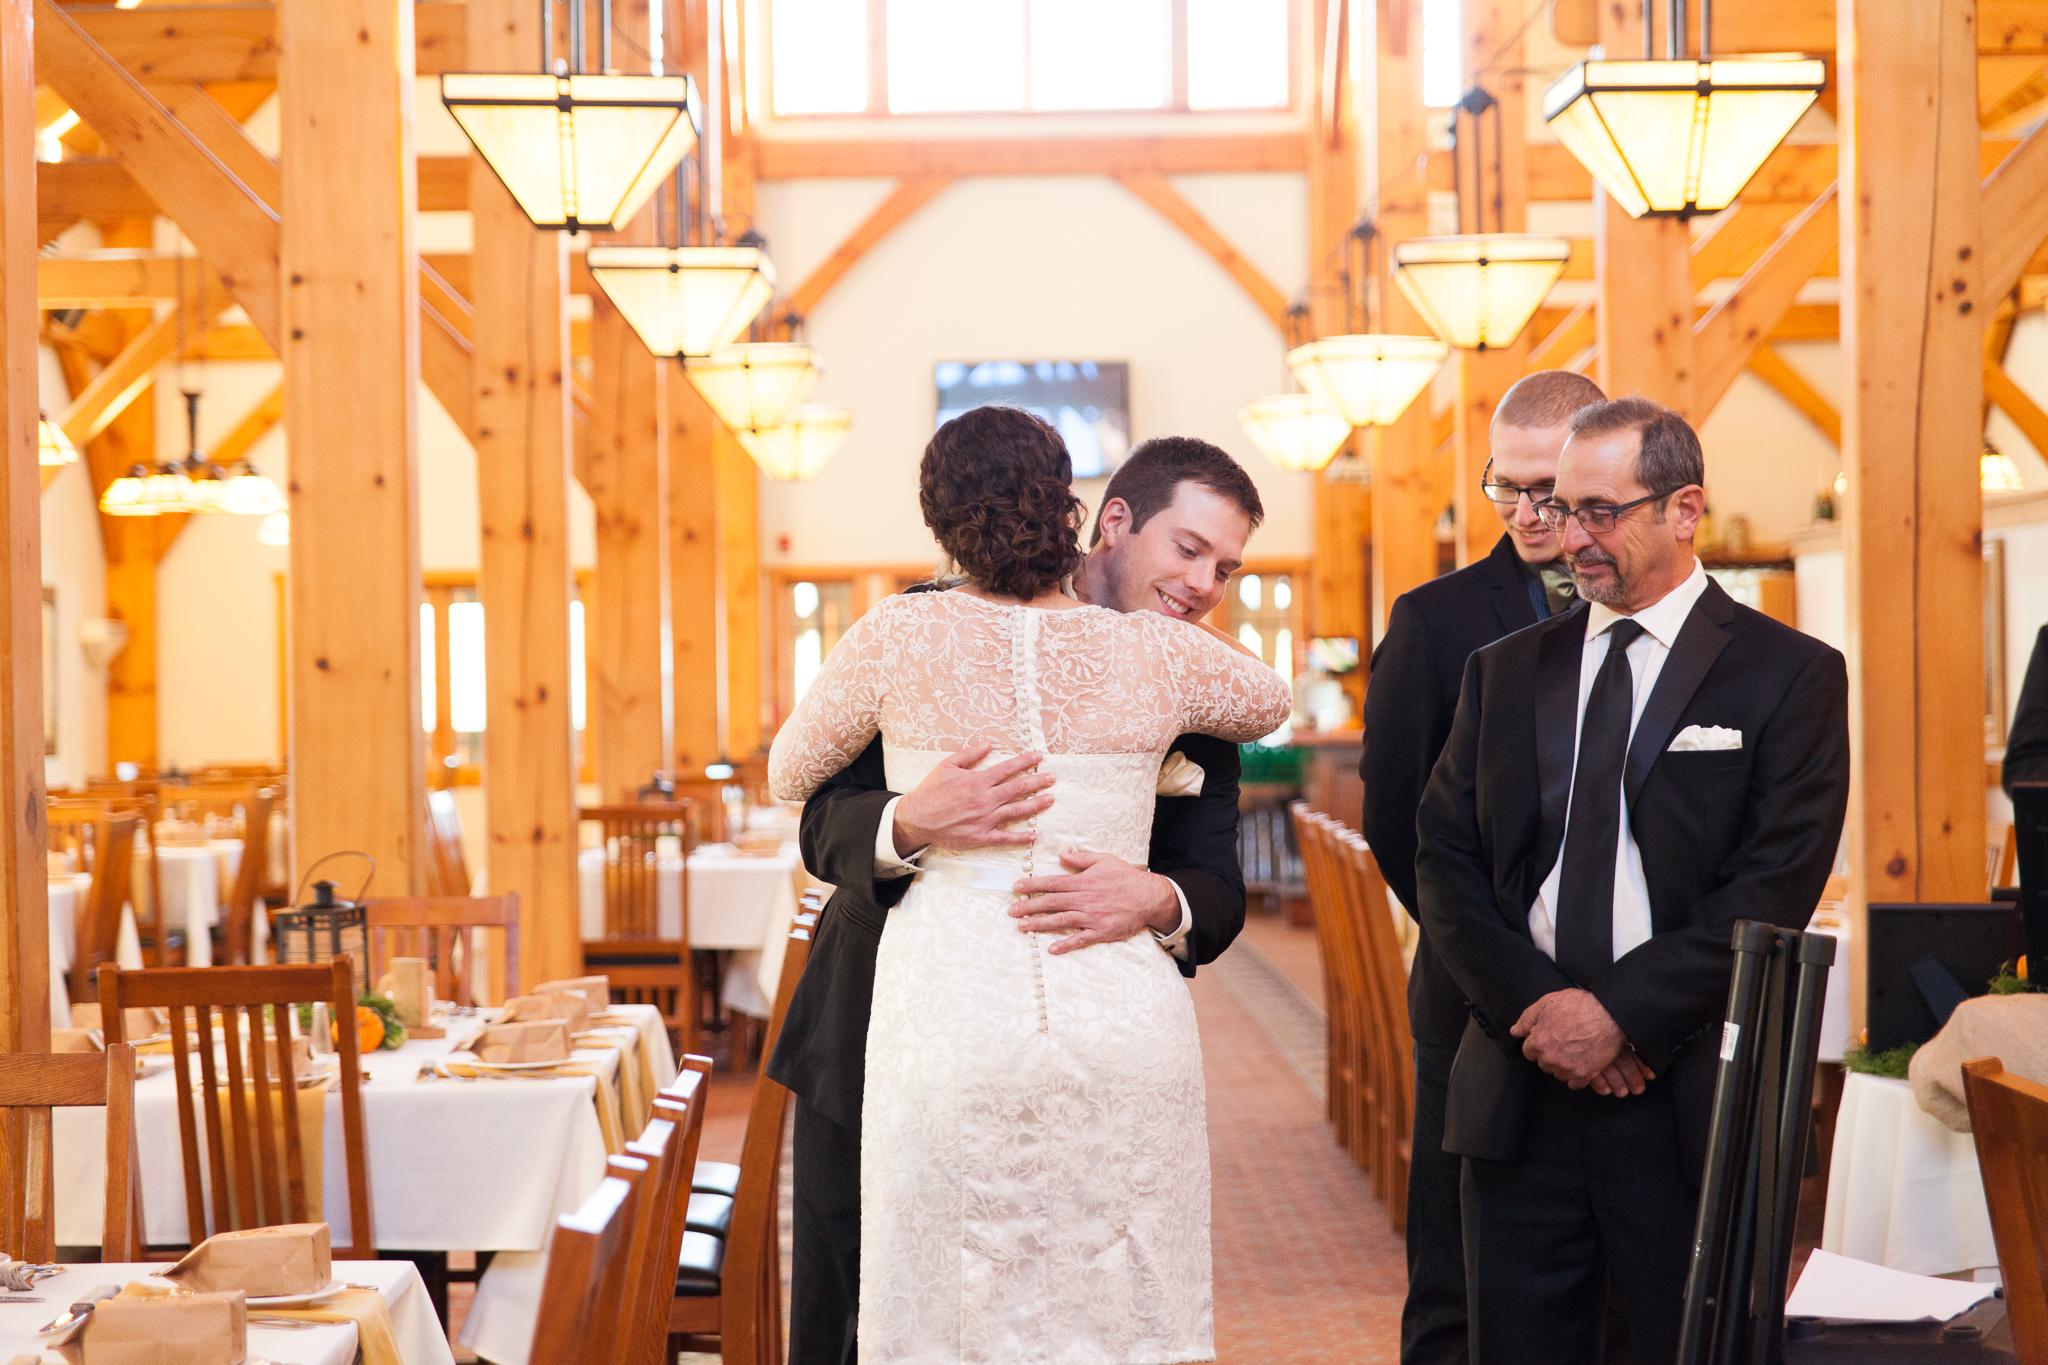 camuglia-whomstudio-chelsea_and_andy-nycphotographer-wedding-brooklyn-buffalo-timberlodge-015-0036.jpg